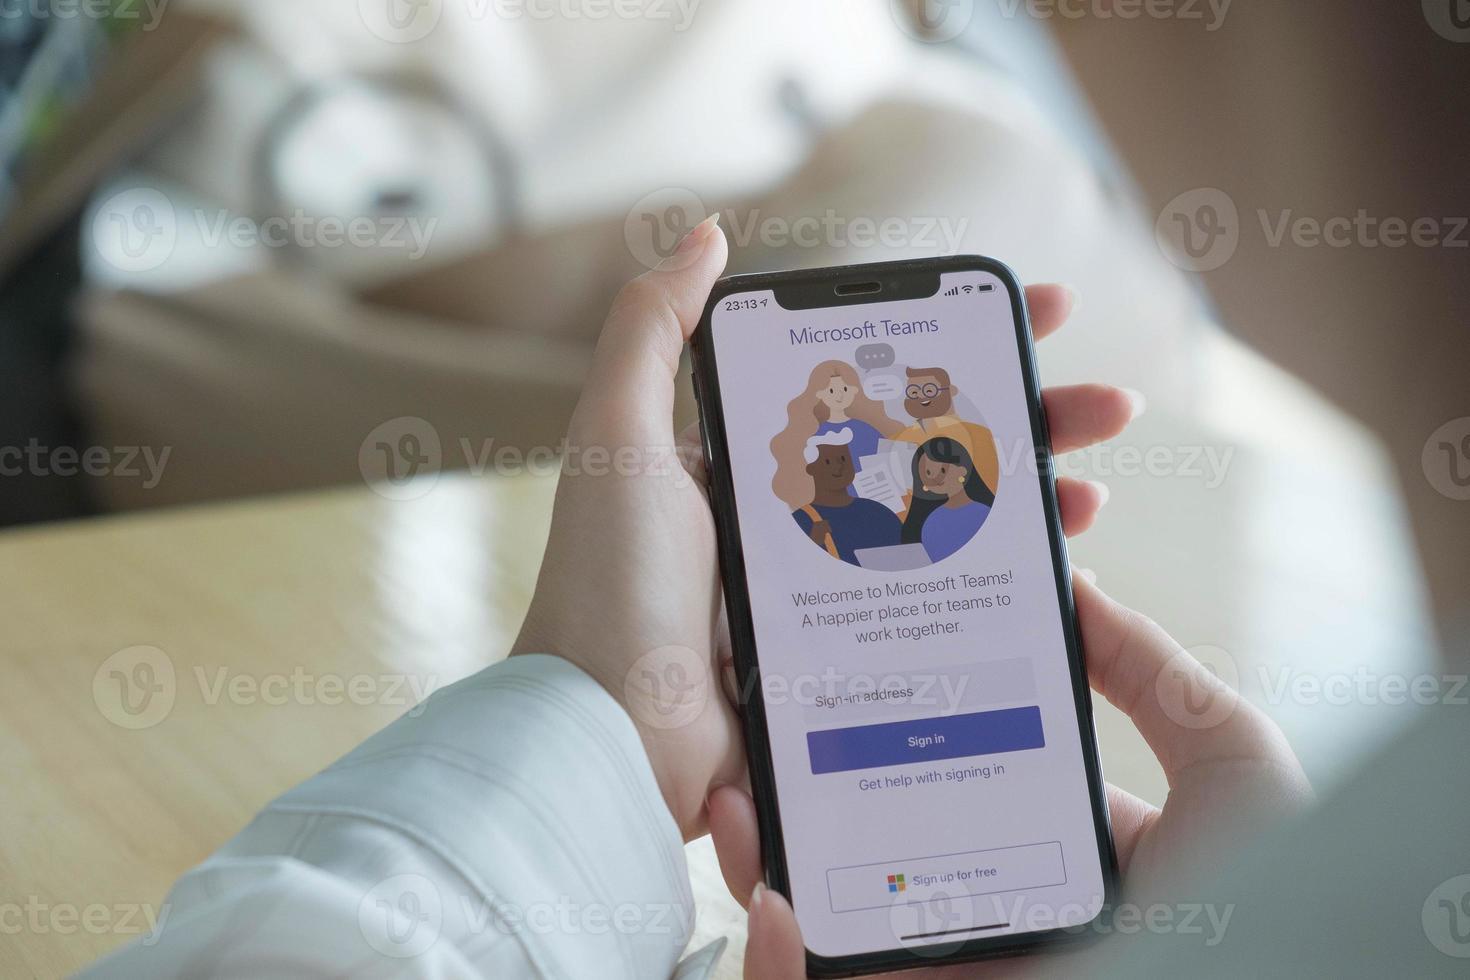 chiang mai, thailand 2020-illustratieve redactie van thuiswerkmedewerker die het sociale platform van microsoft teams gebruikt foto